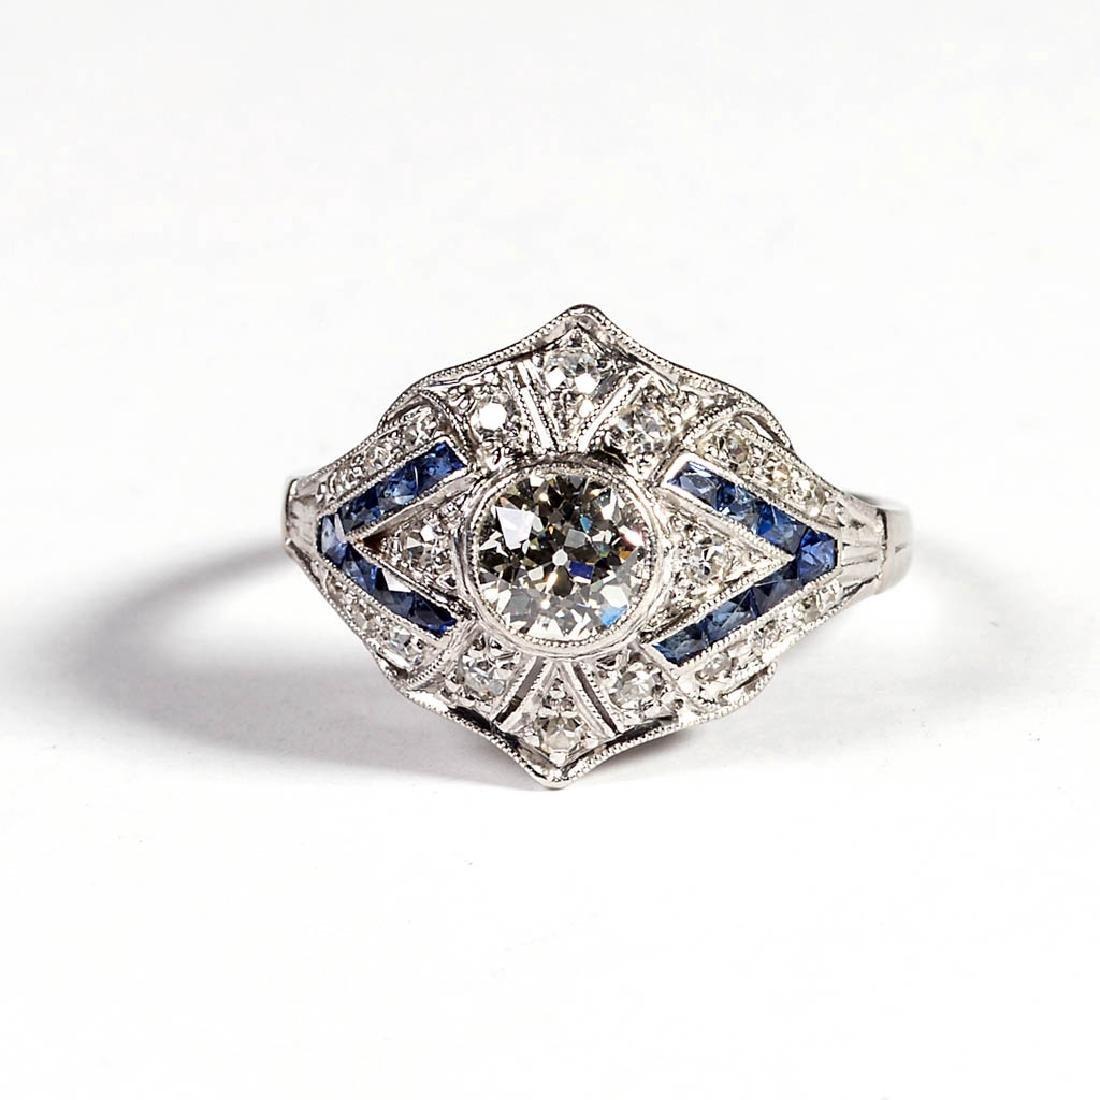 ART DECO LADY'S PLATINUM, DIAMOND AND SAPPHIRE RING